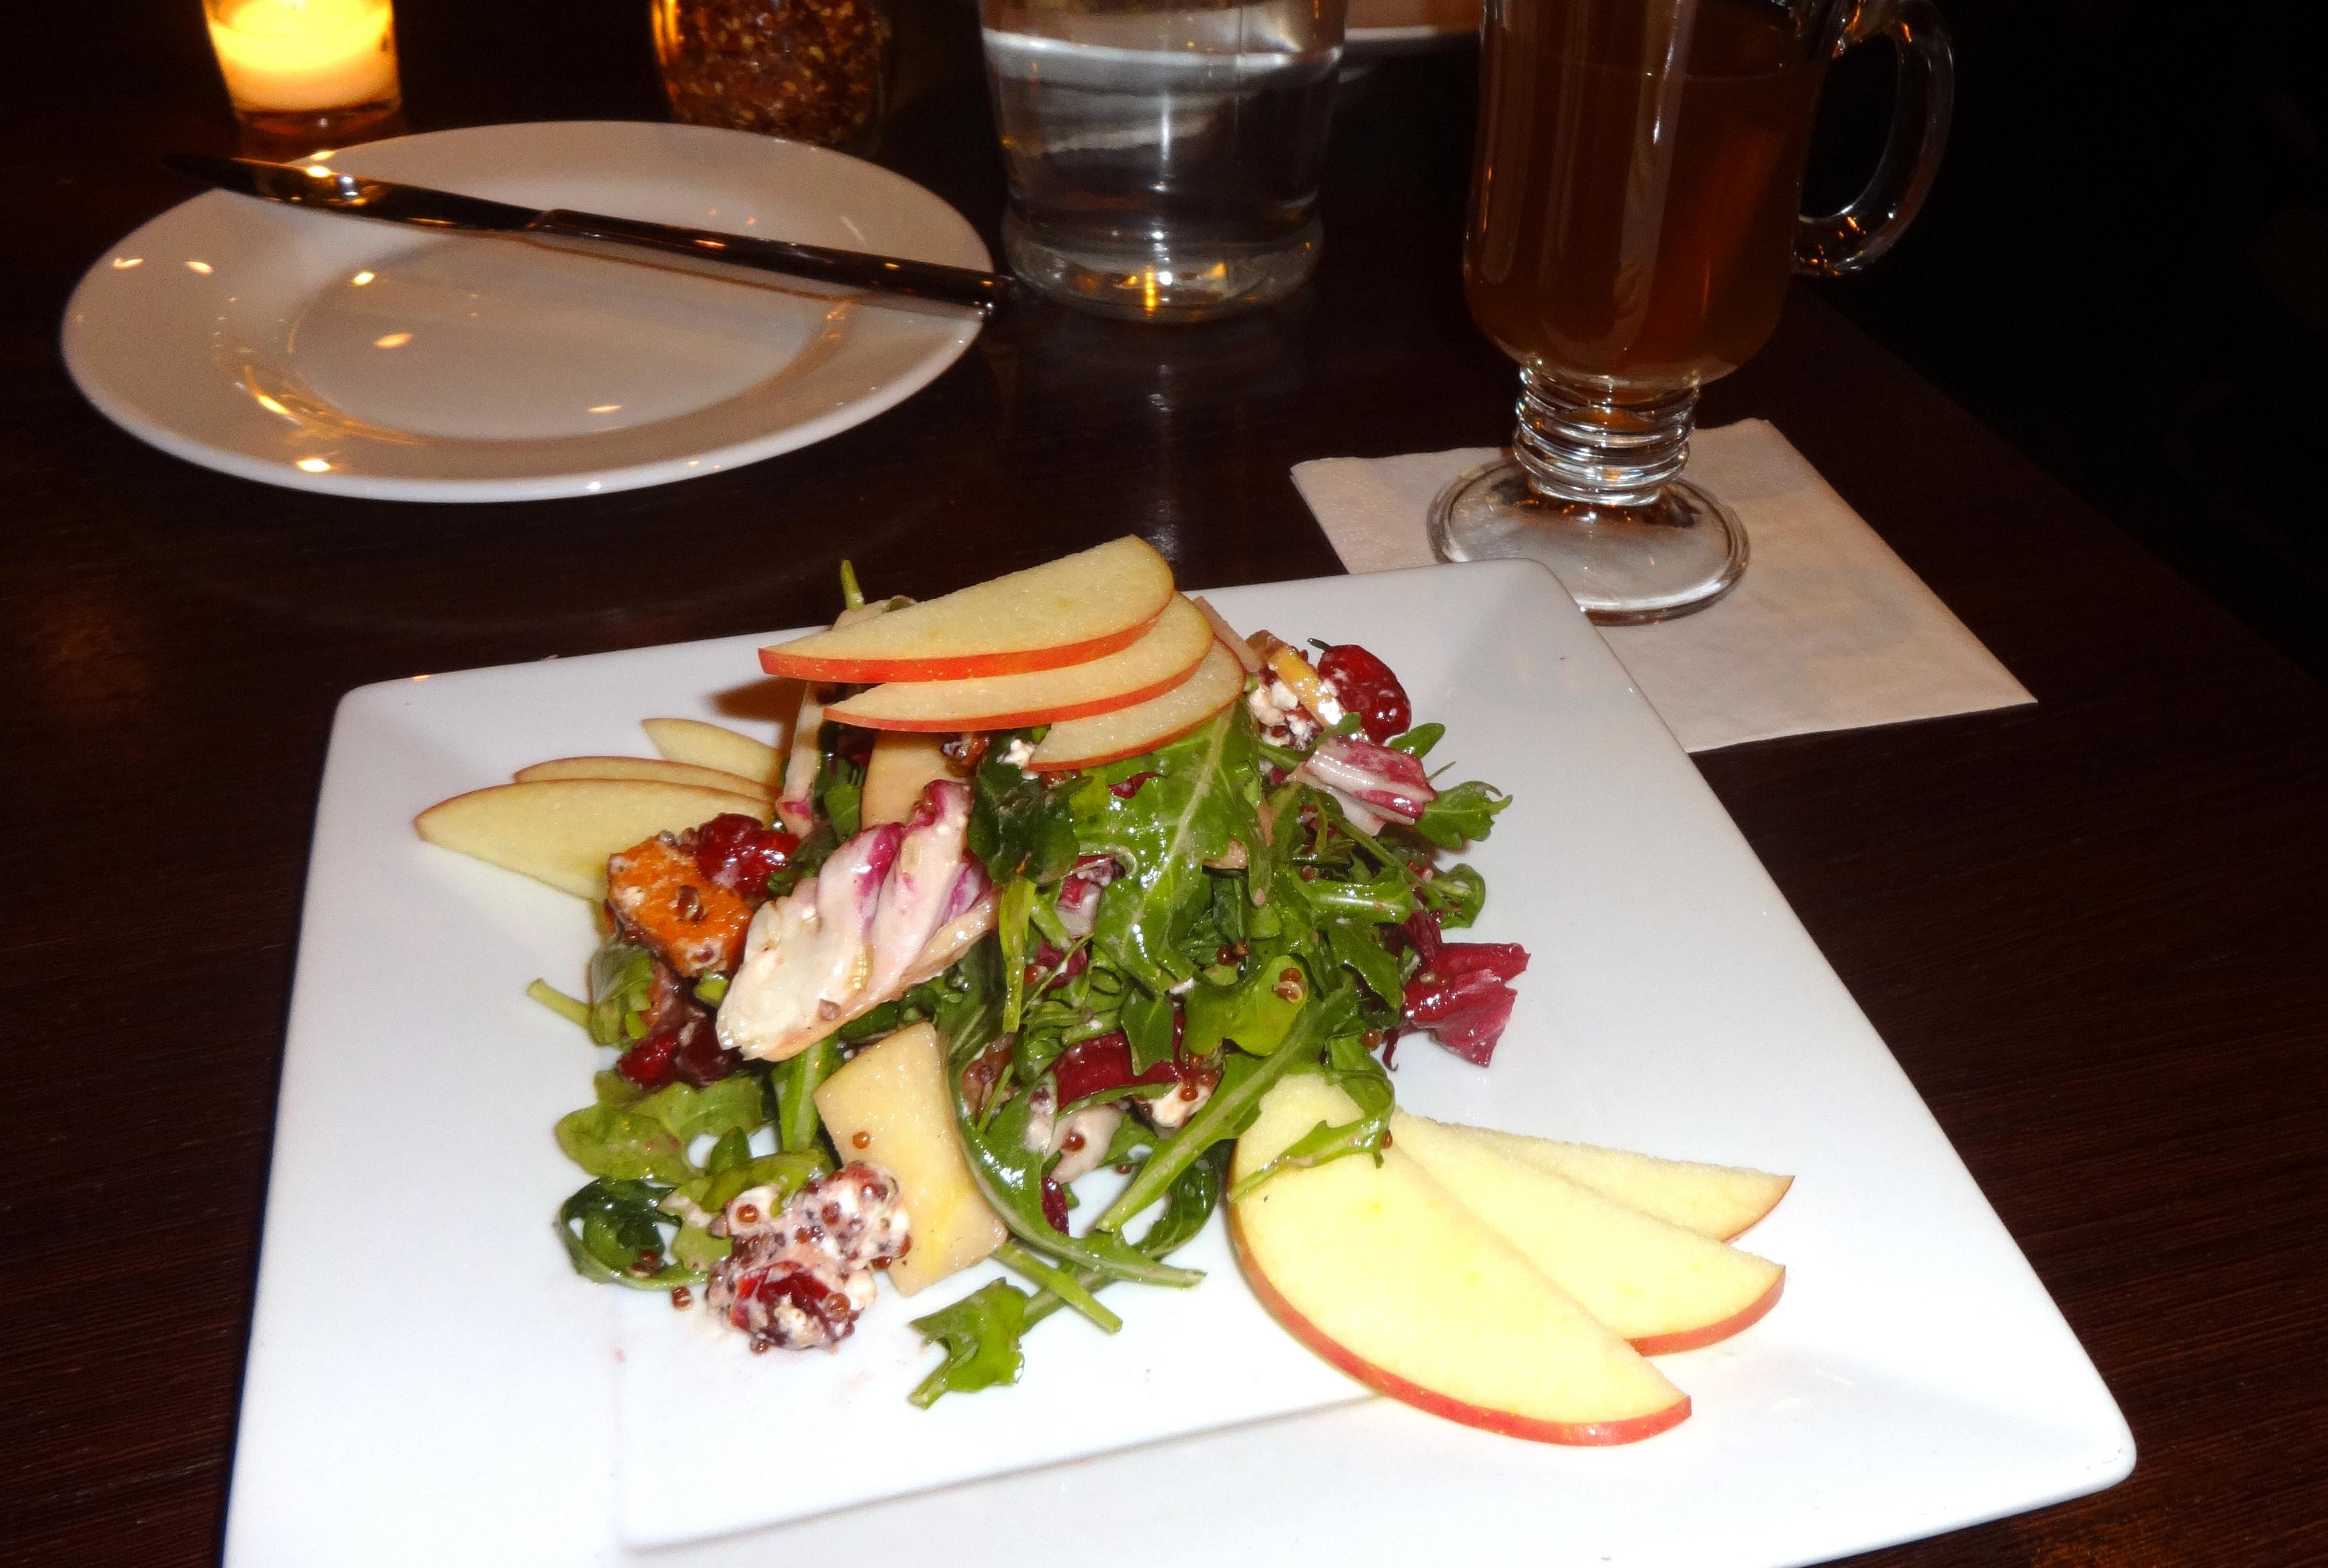 American Flatbread salad crop